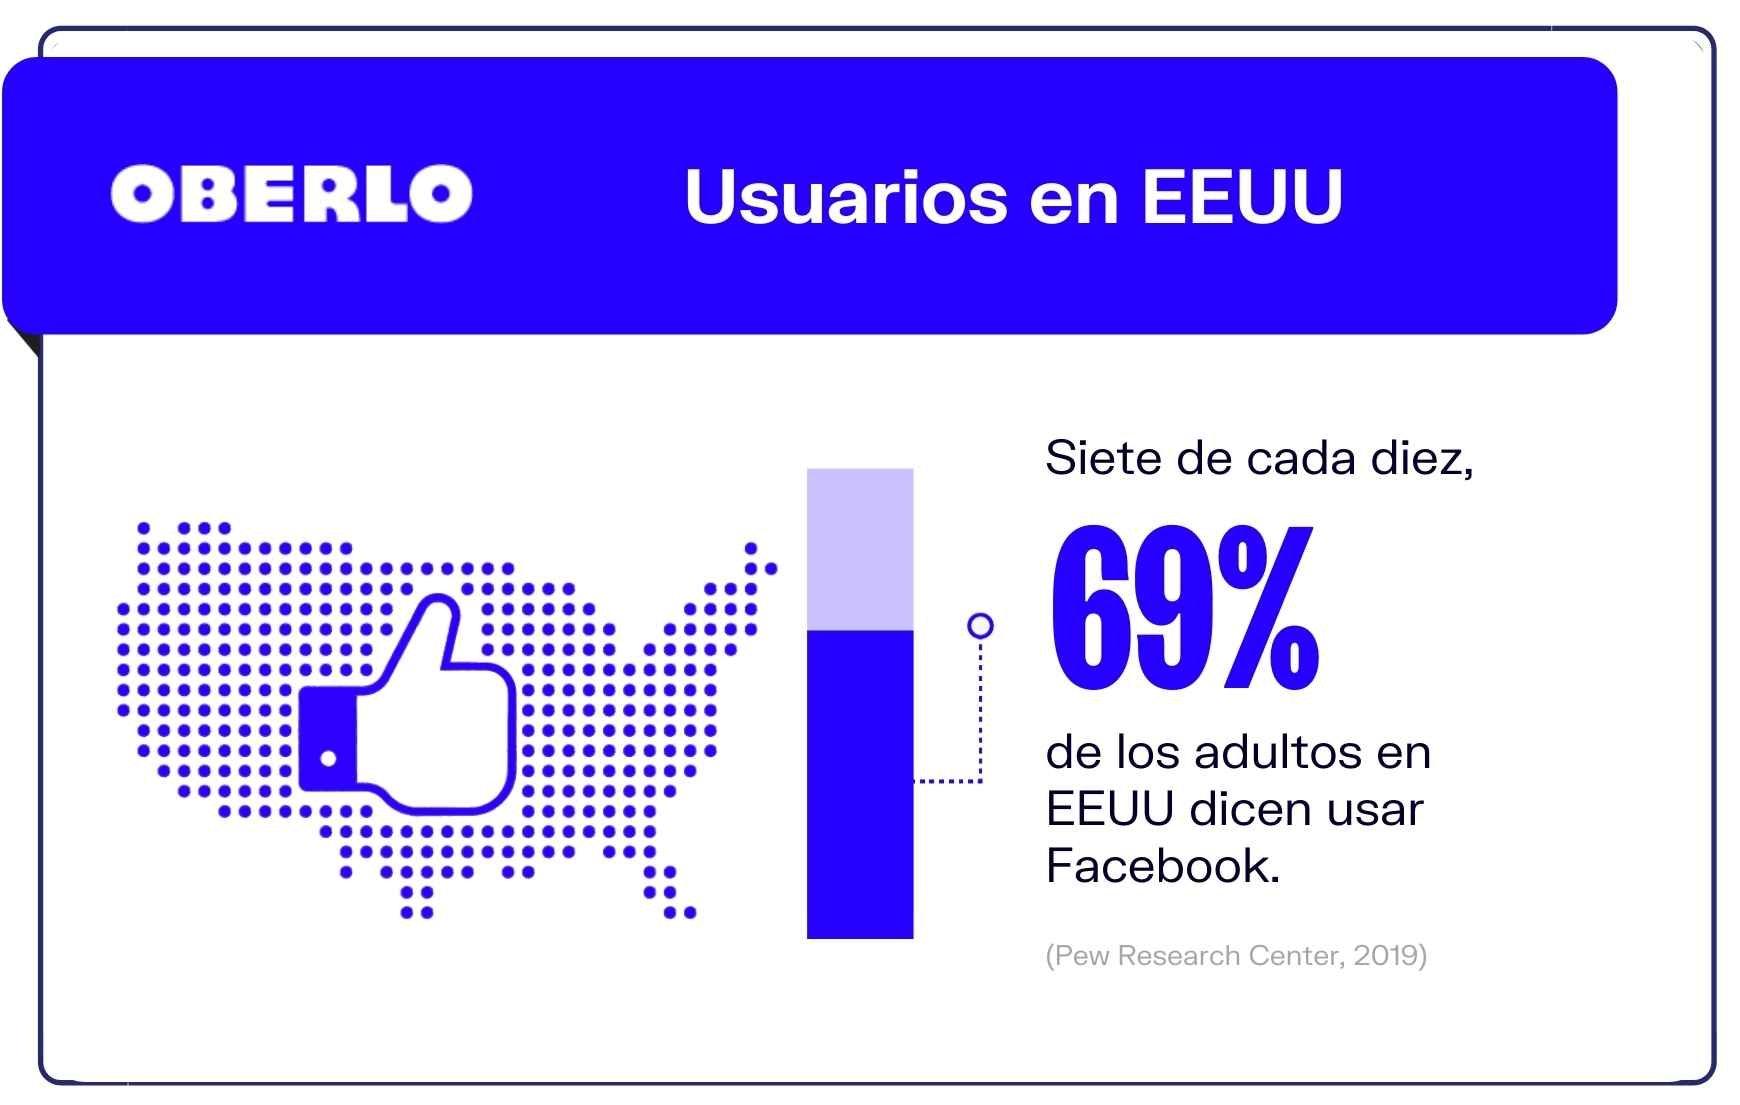 Facebook en datos